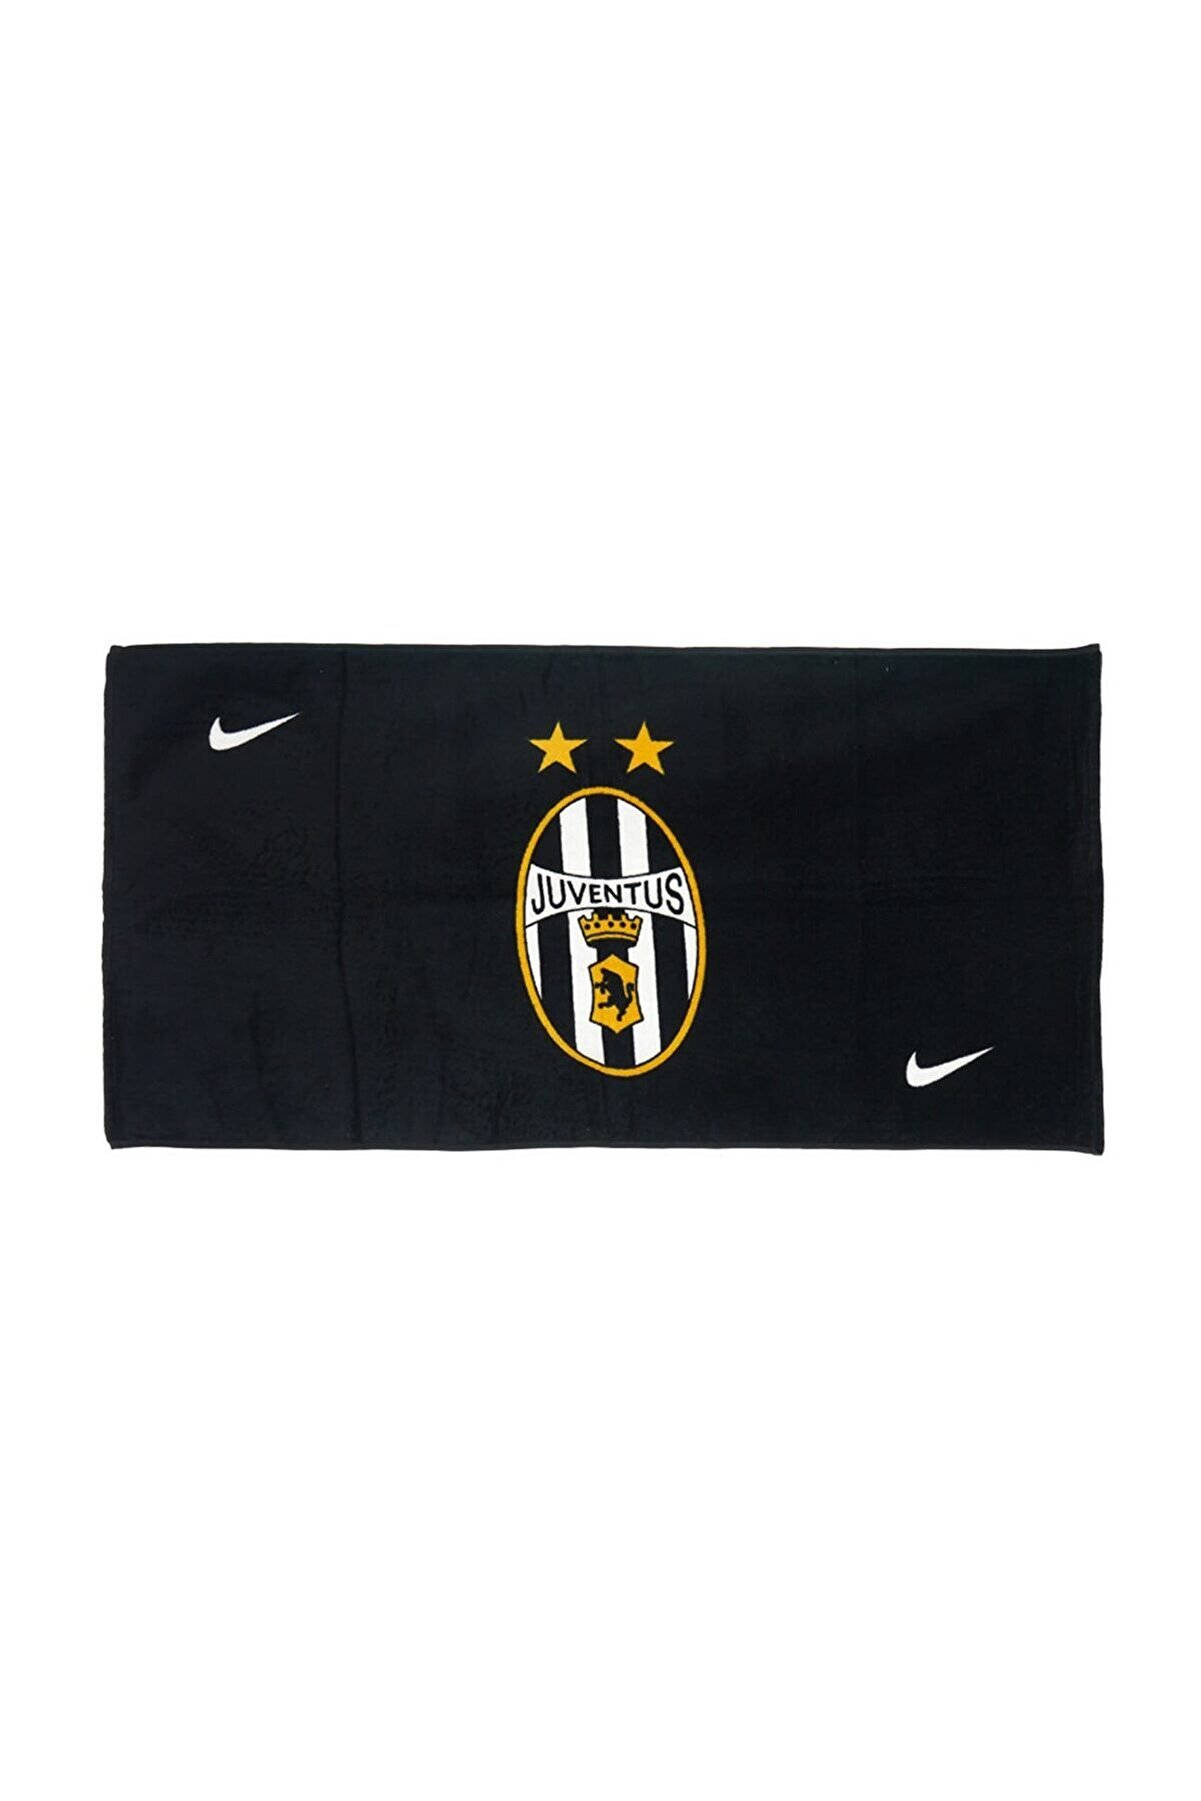 Nike Havlu Juve Sport Towel 591902-010 Siyah